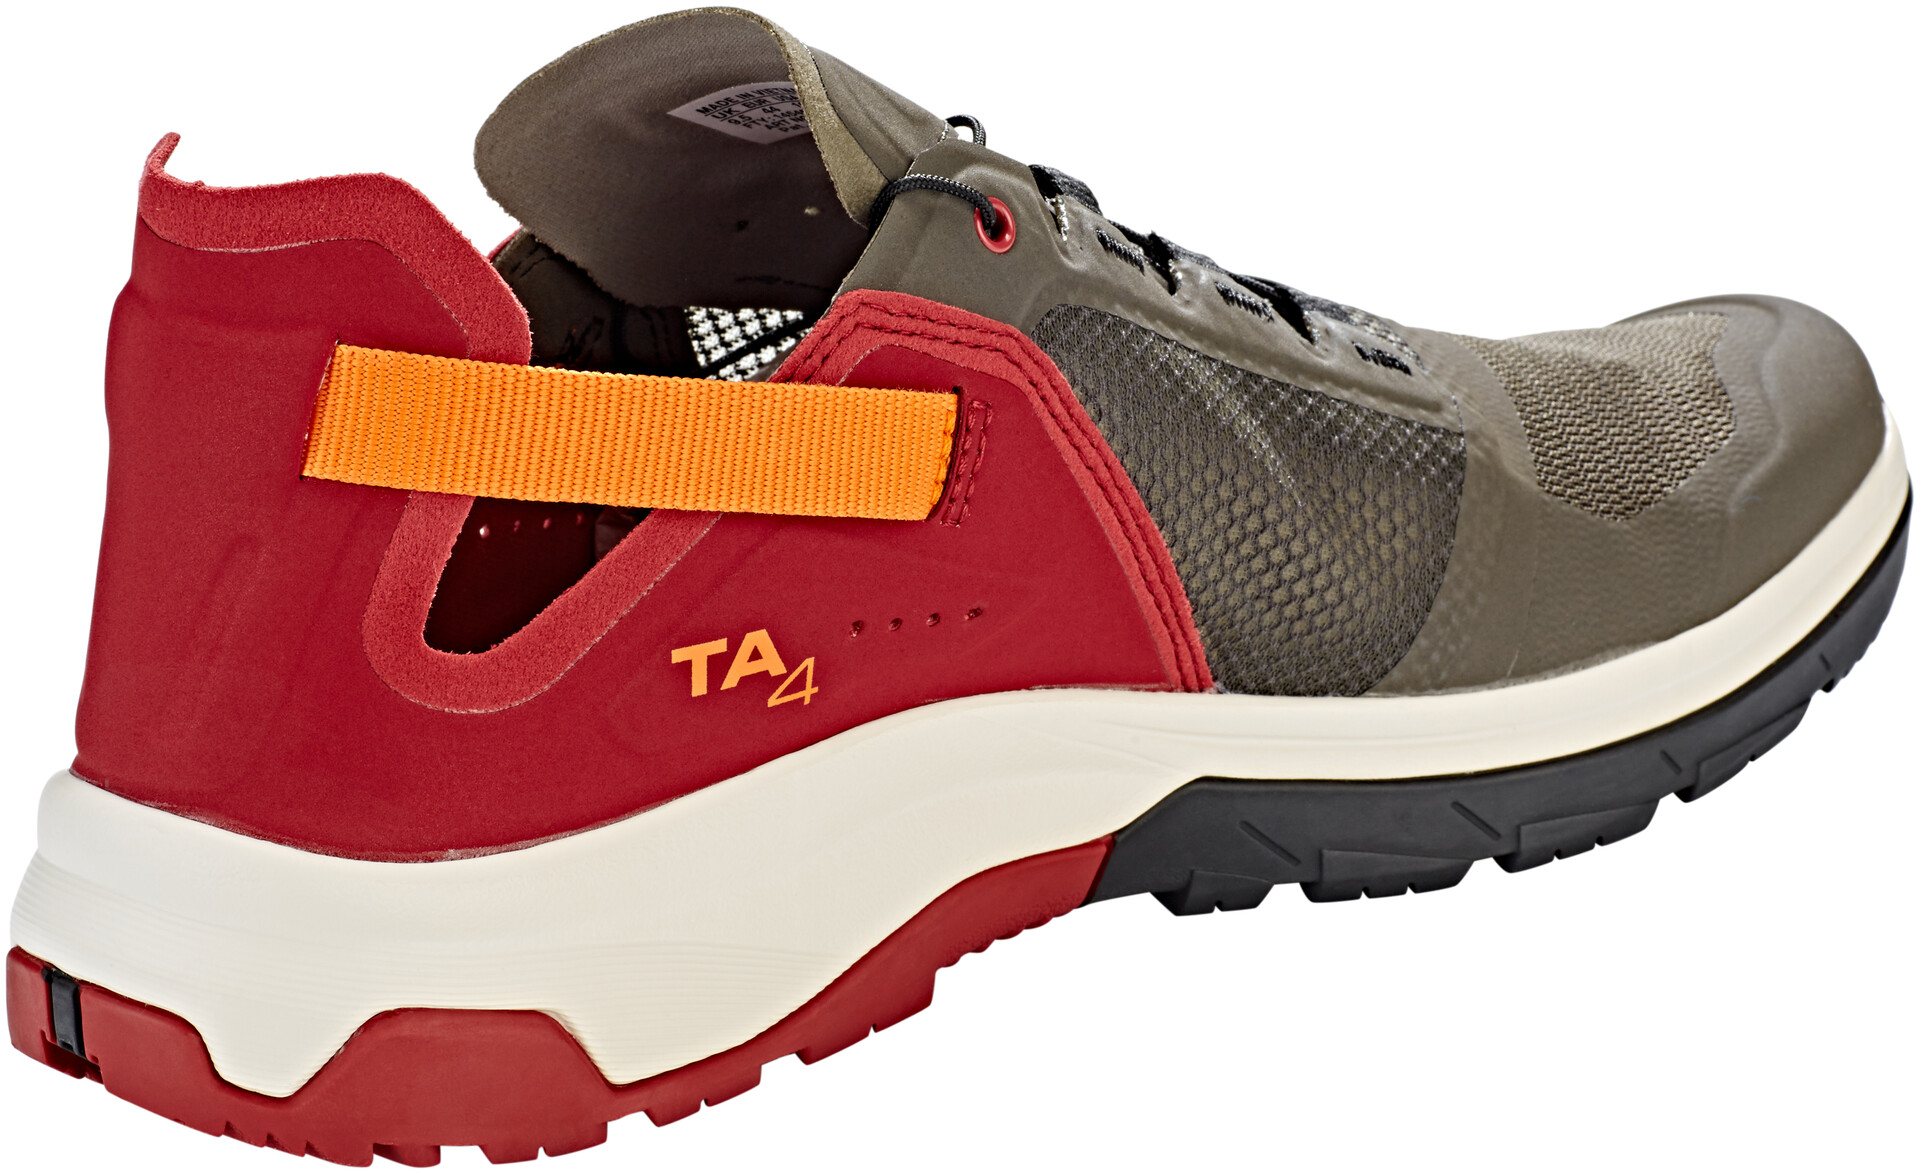 Salomon Techamphibian 4 Chaussures Homme, belugarusset orangered dahlia